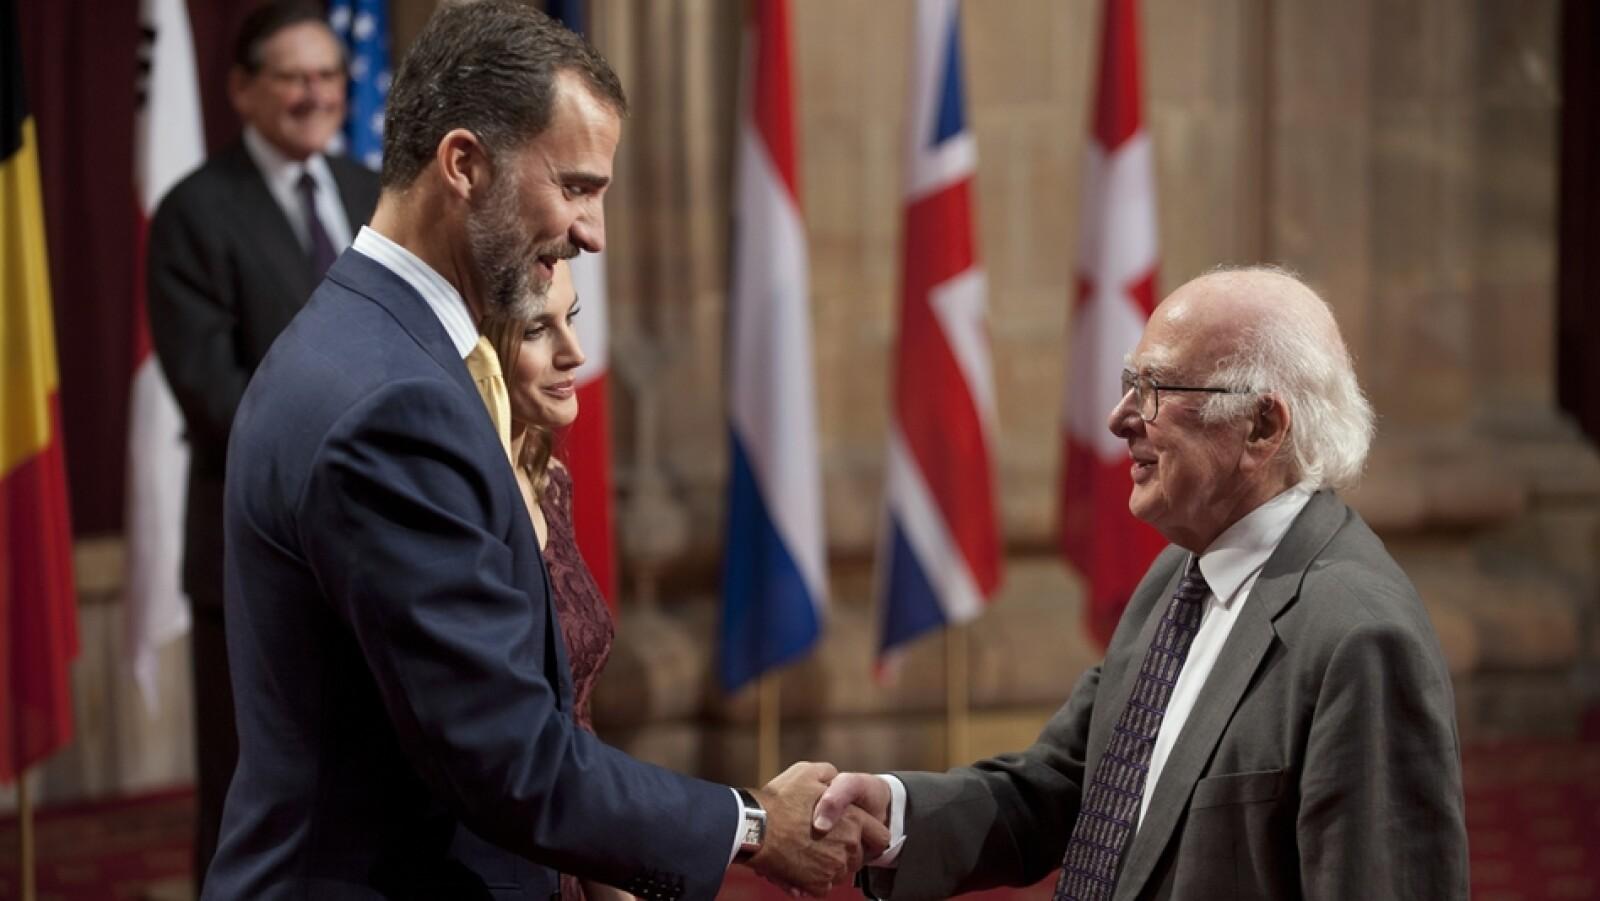 Peter Higgs boson de Higgs Principe de Asturias